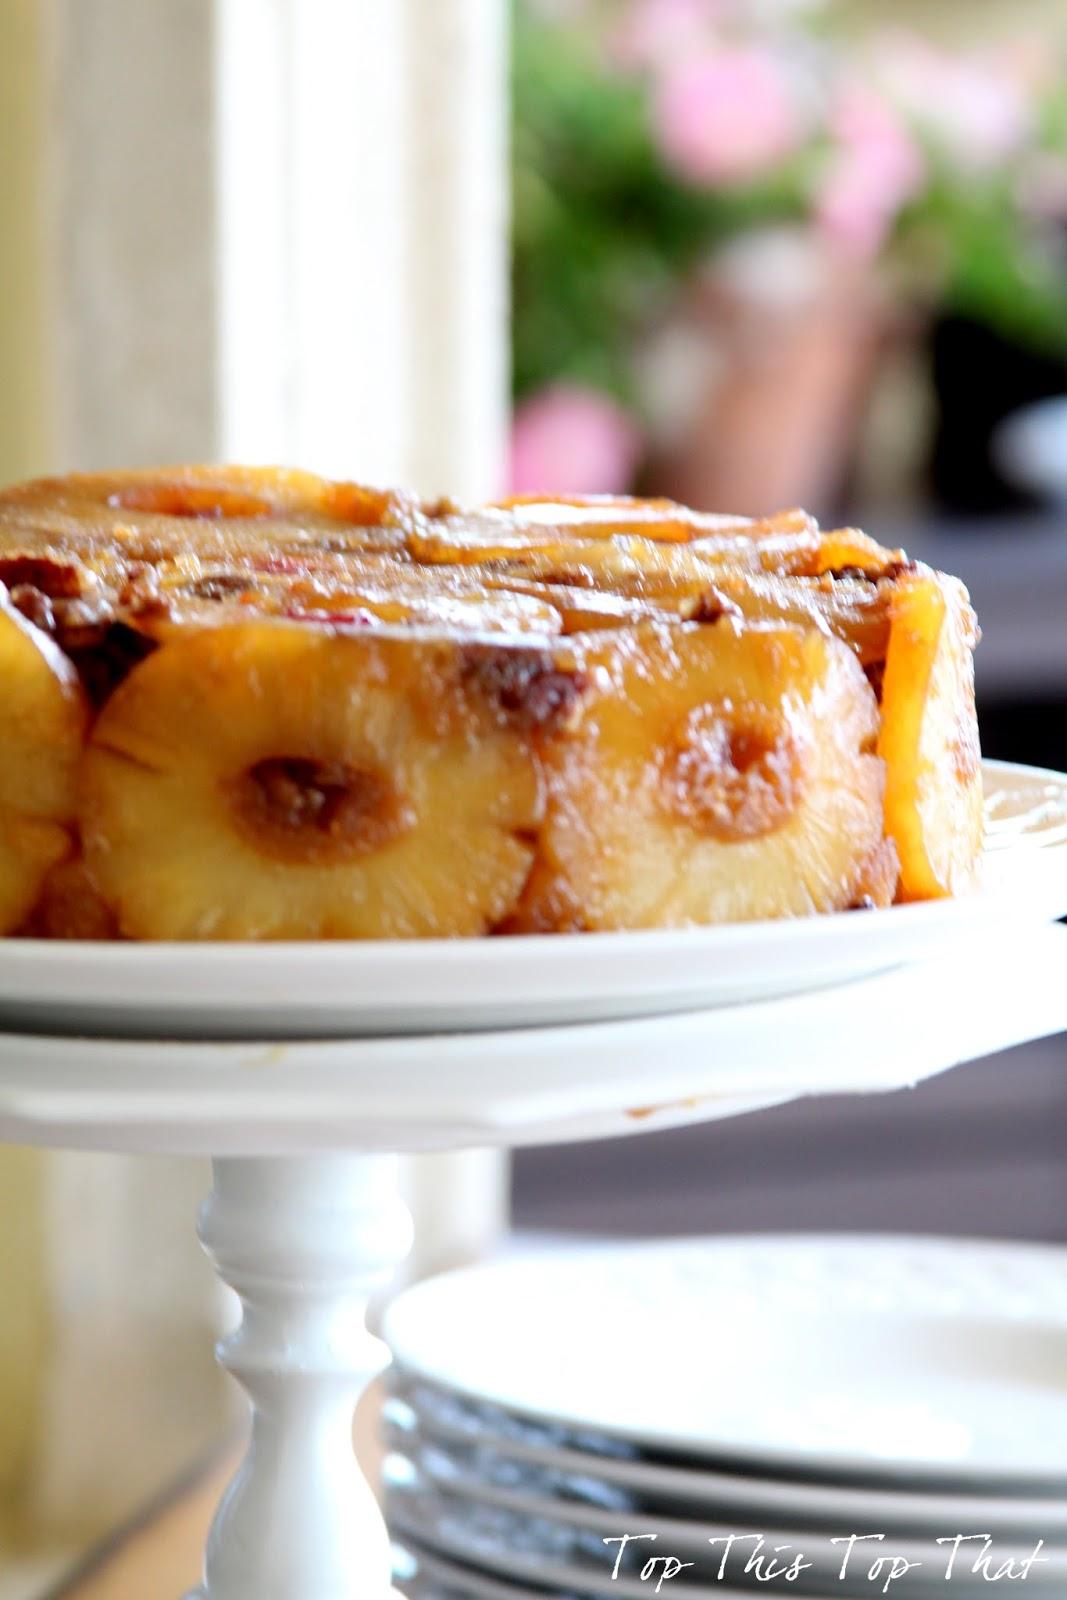 Best Cast Iron Skillet Pineapple Upside Down Cake